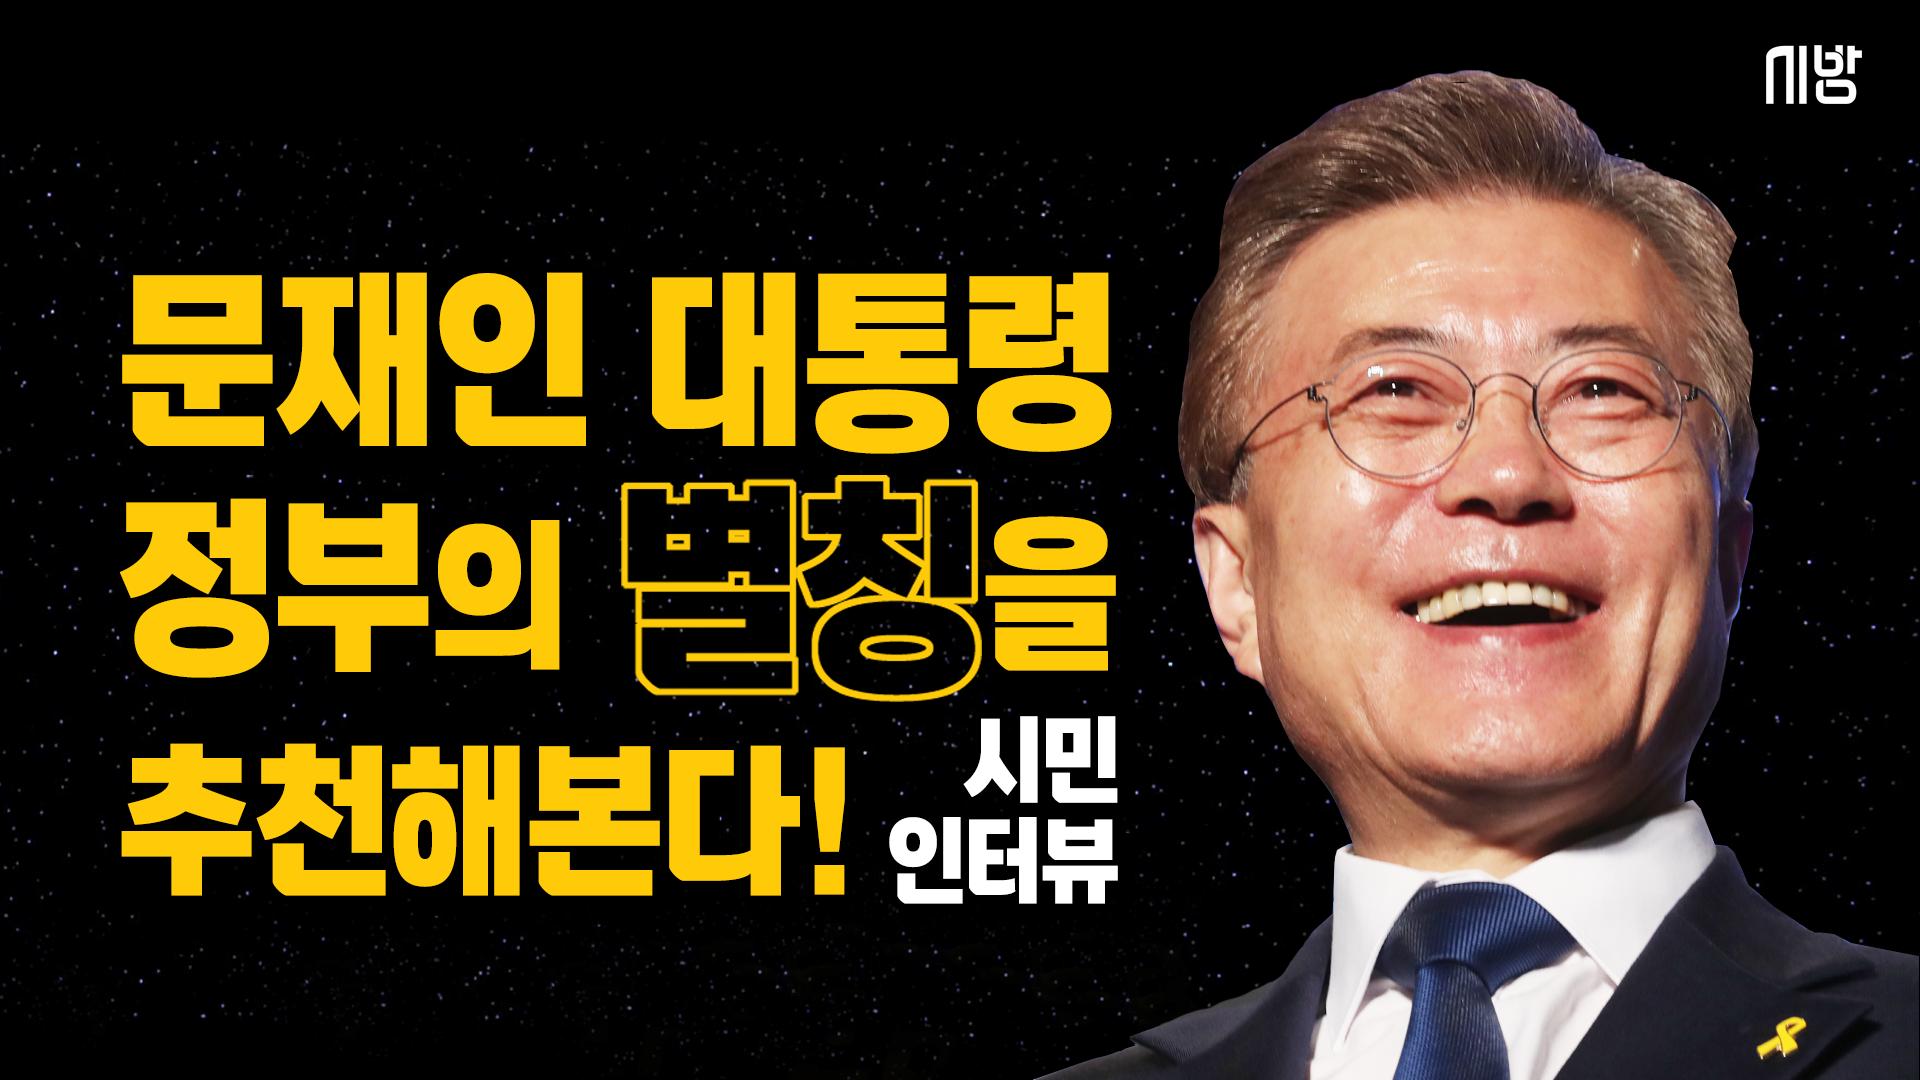 [tbs/시방] 문재인 대통령 정부의 별칭을 추천해봅니다! feat 시민 인터뷰